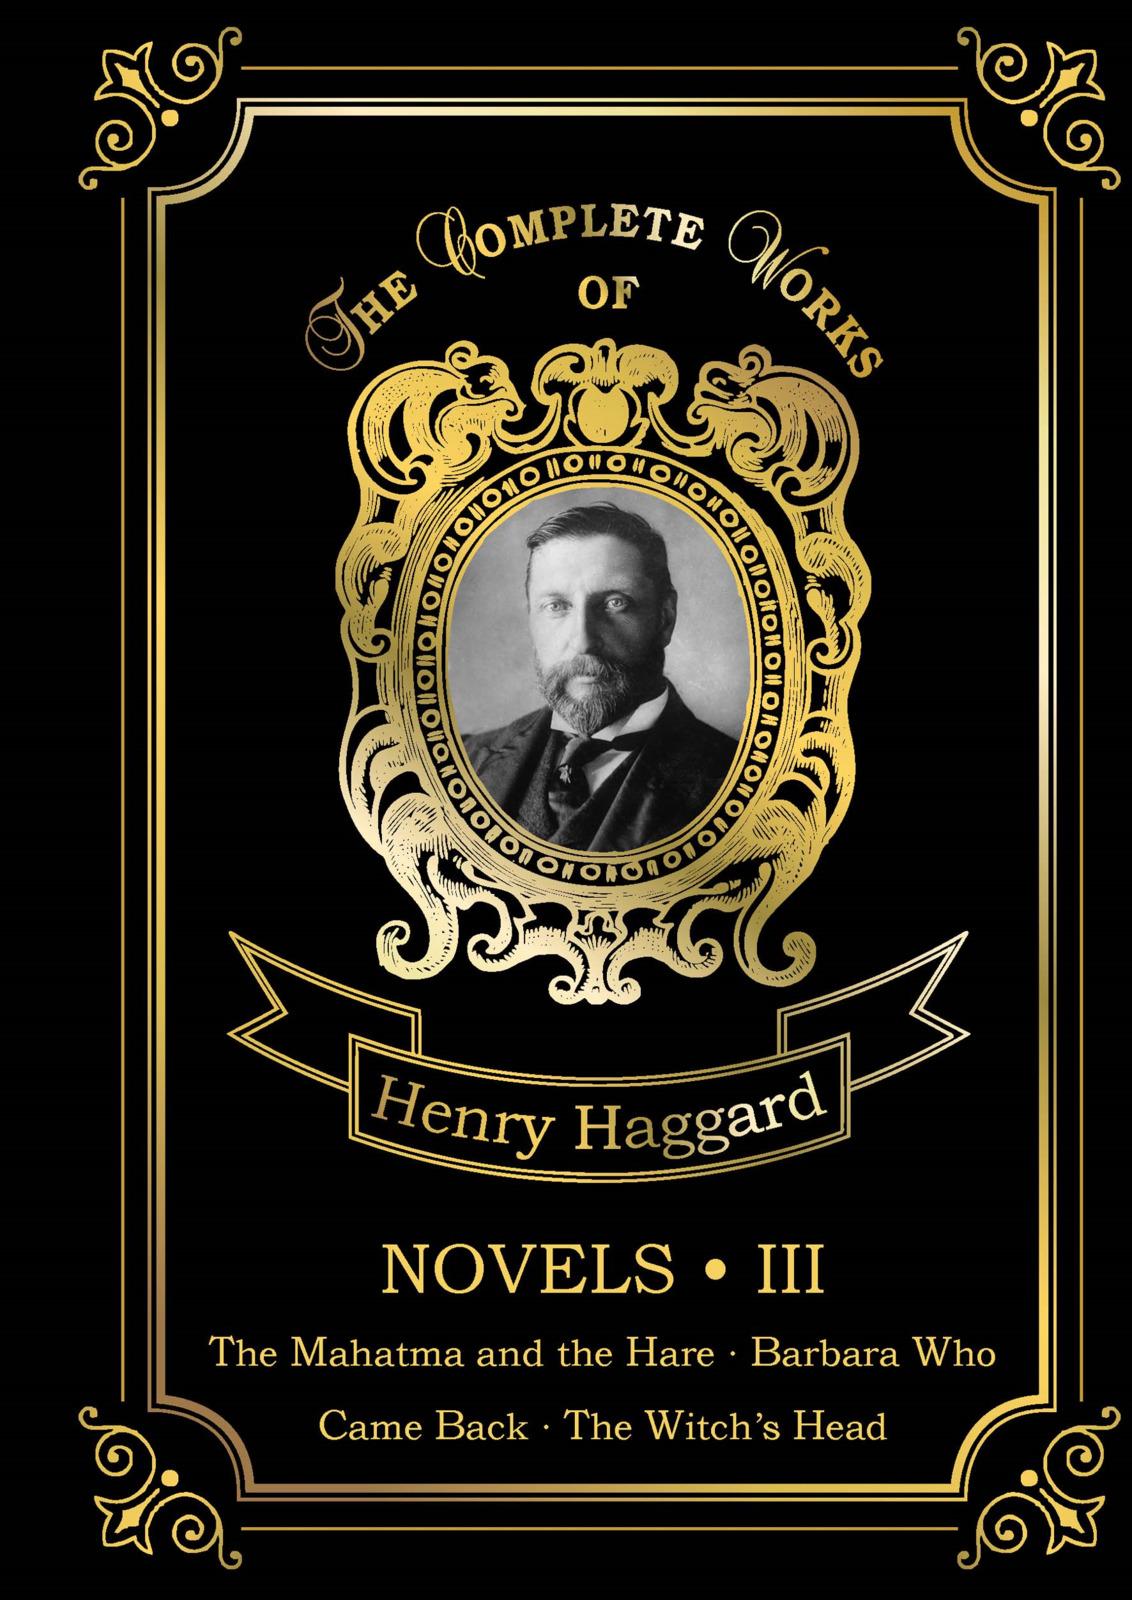 Henry Haggard Novels III haggard h novels iii the mahatma and the hare barbara who came back the witch s head